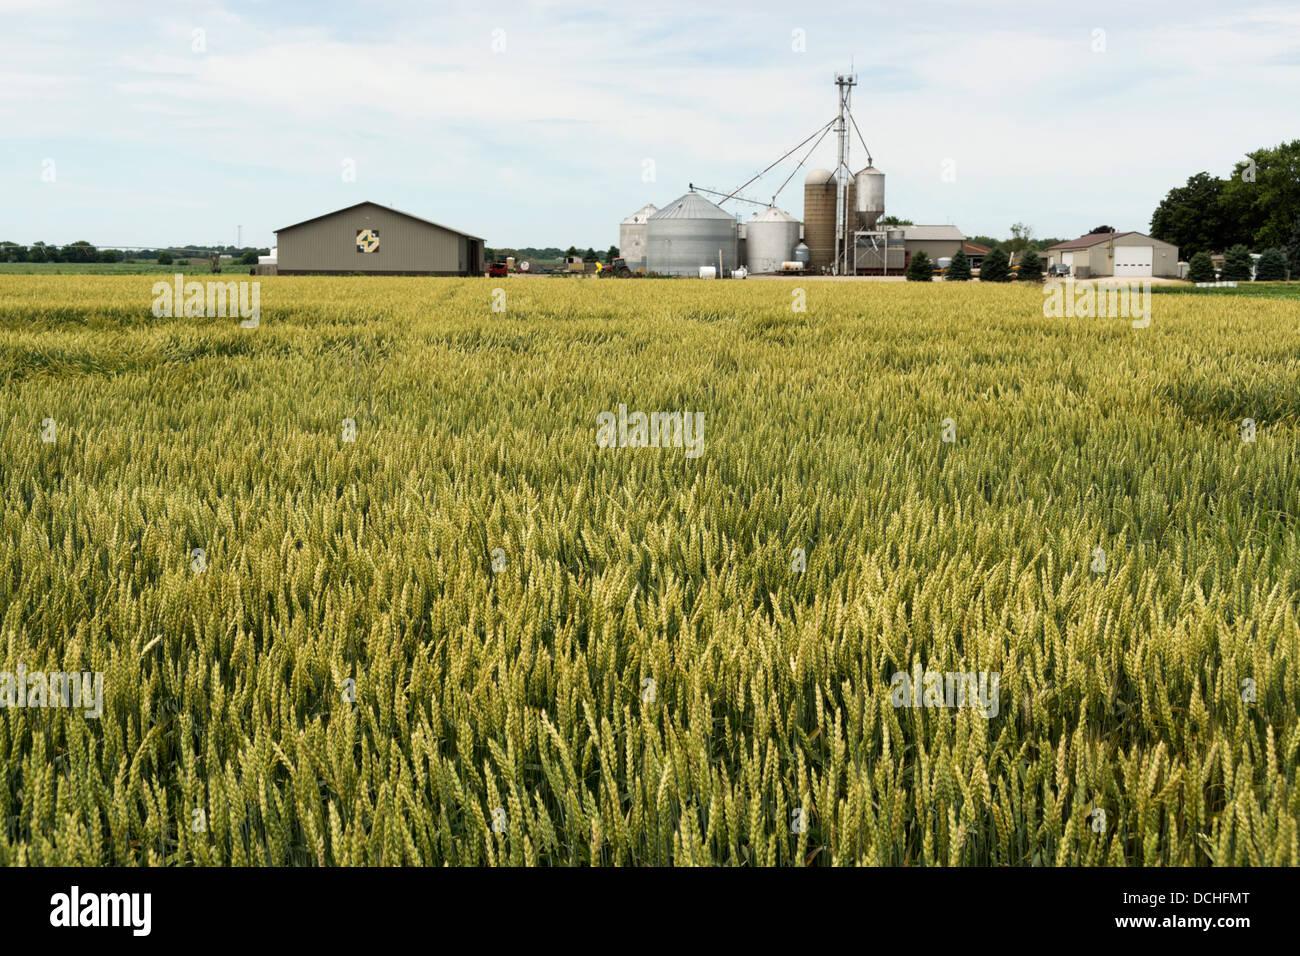 Wheat ripening in a north Illinois farm field. - Stock Image